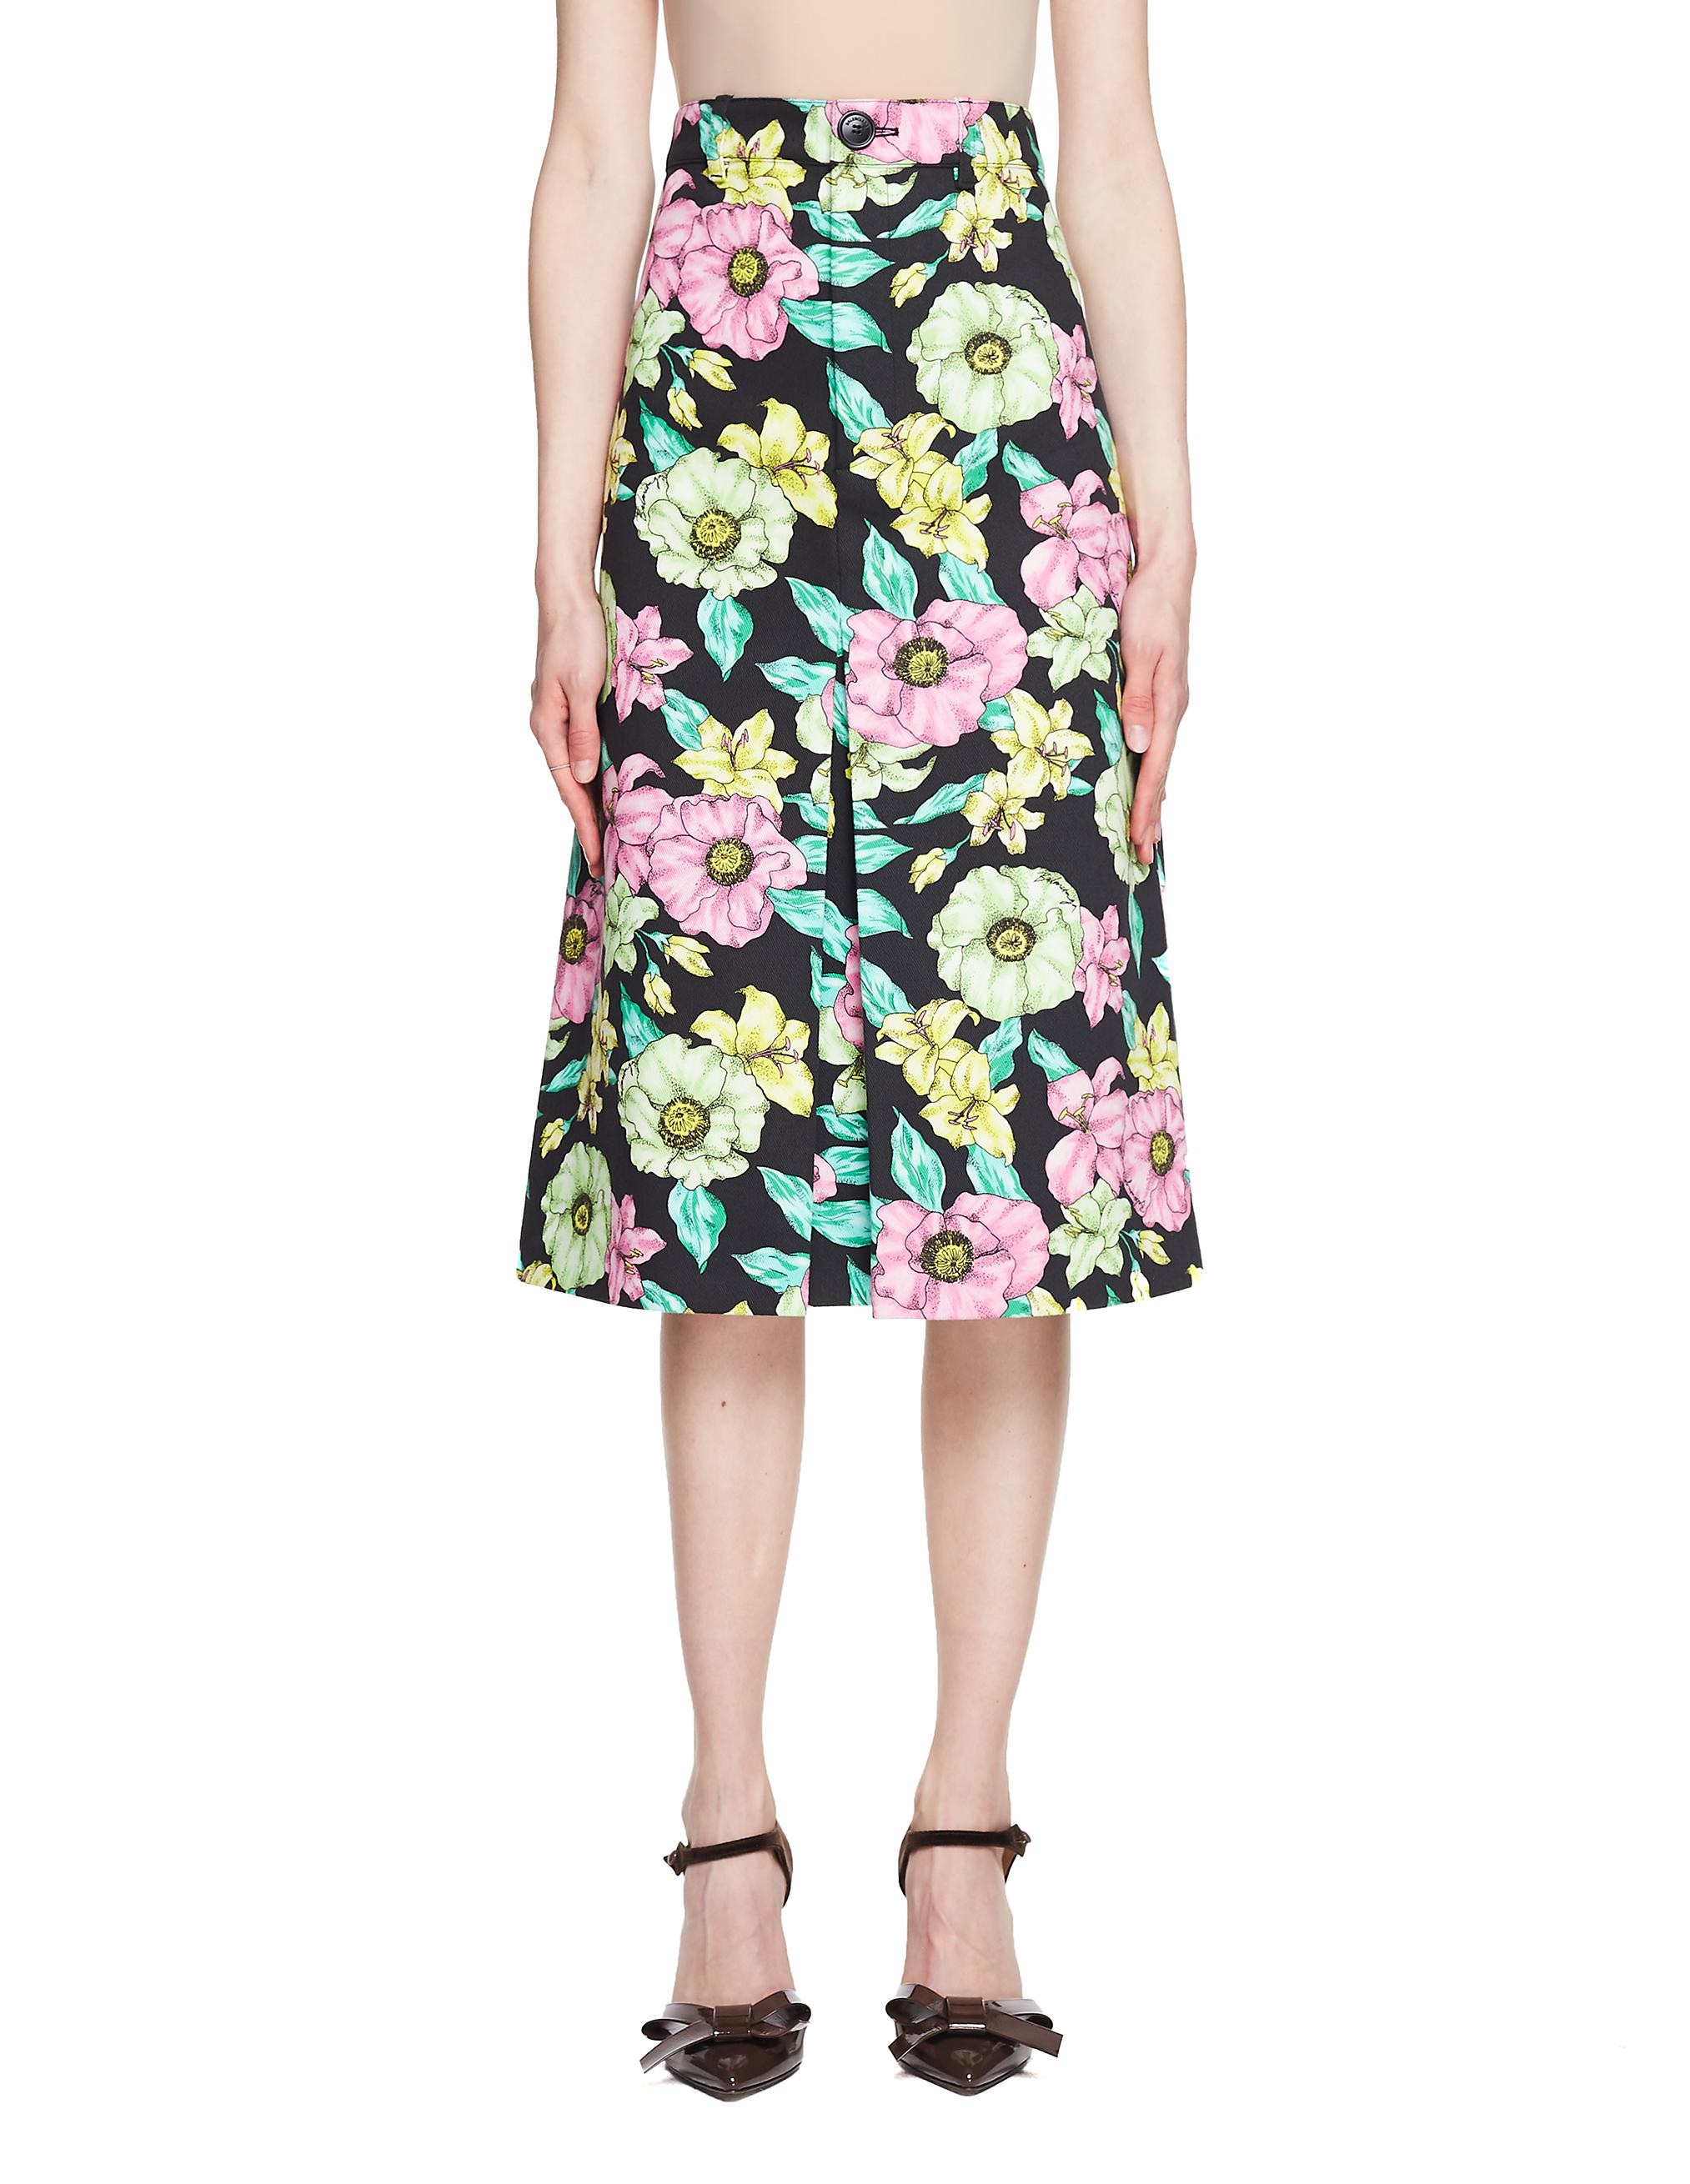 Balenciaga Flower Printed Cotton Pleat Skirt